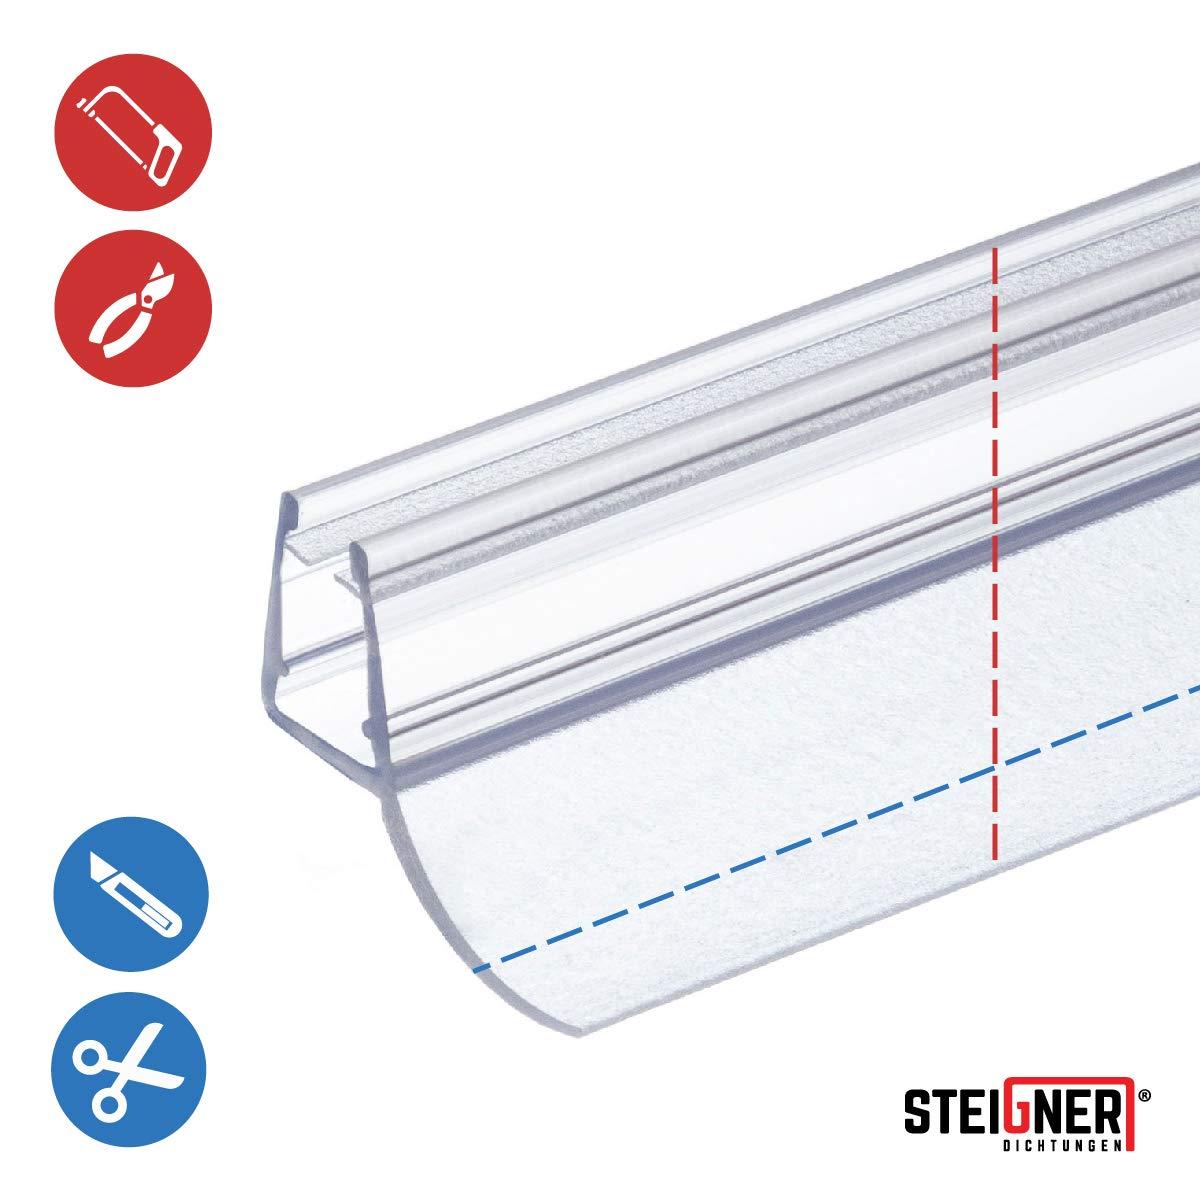 70cm UK12 Junta de recambio para ducha deflector de 5mm// 6mm// 7mm// 8mm vidrio grueso agua sello ducha de protecci/ón de sobretensi/ón recta